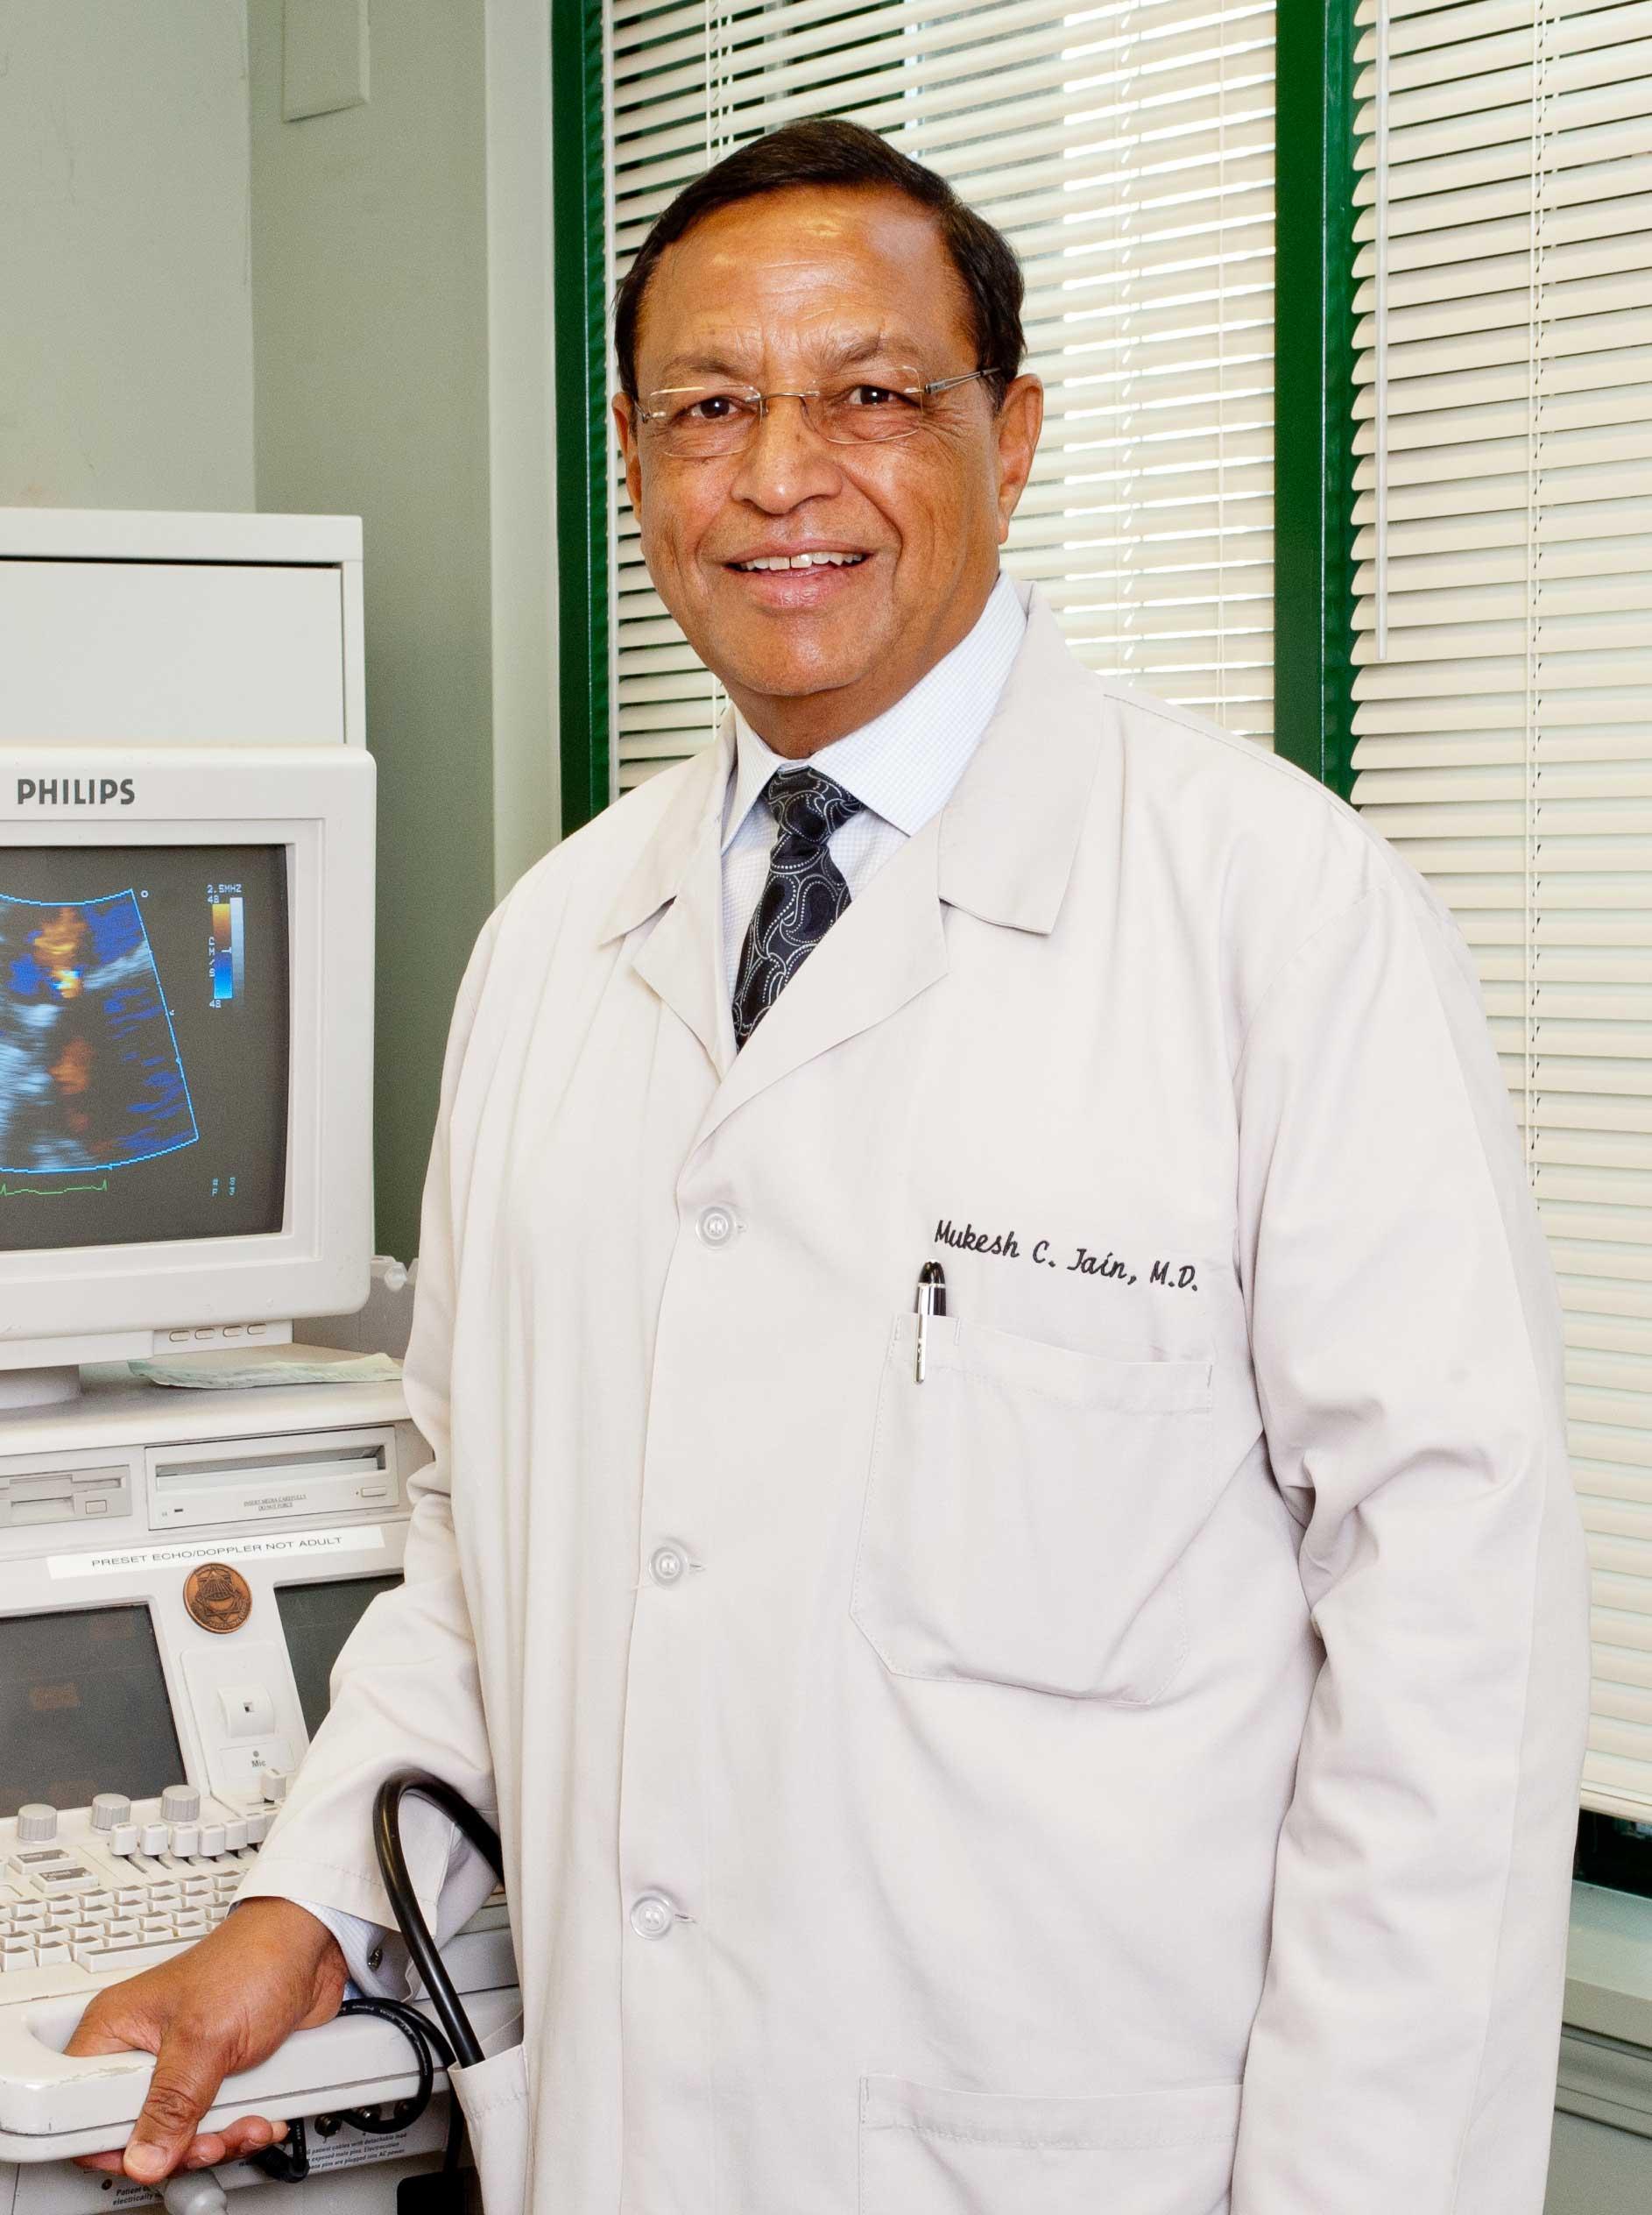 Dr. Mukesh C. Jain